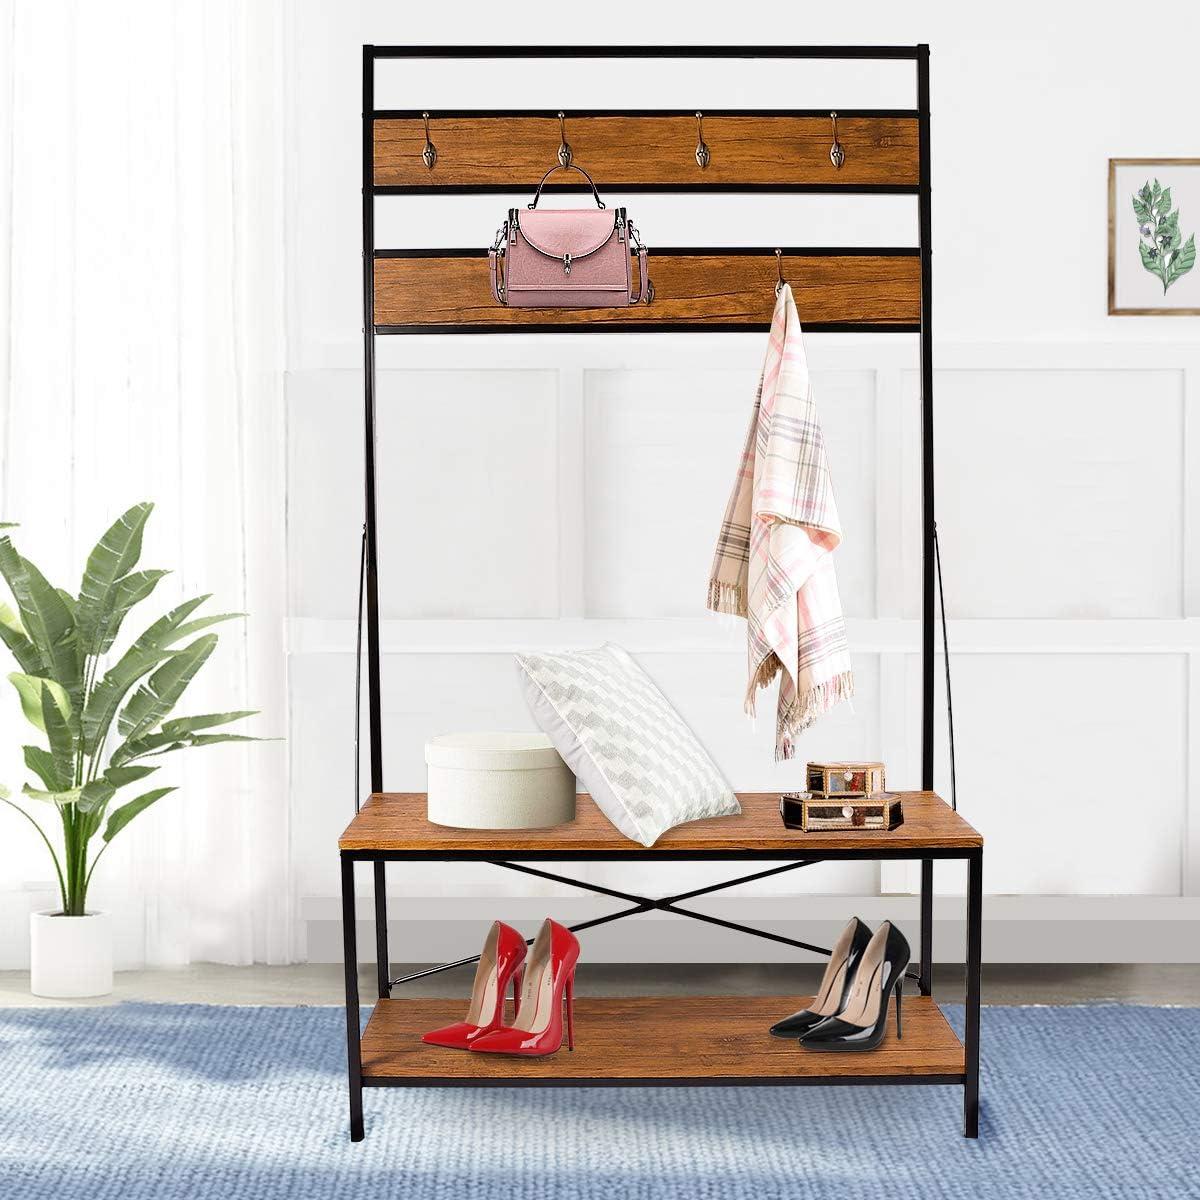 LASUAVY Ladder Shelf Bookcase Multi-Functional Modern Wood Storage Display Open Bookshelf Four